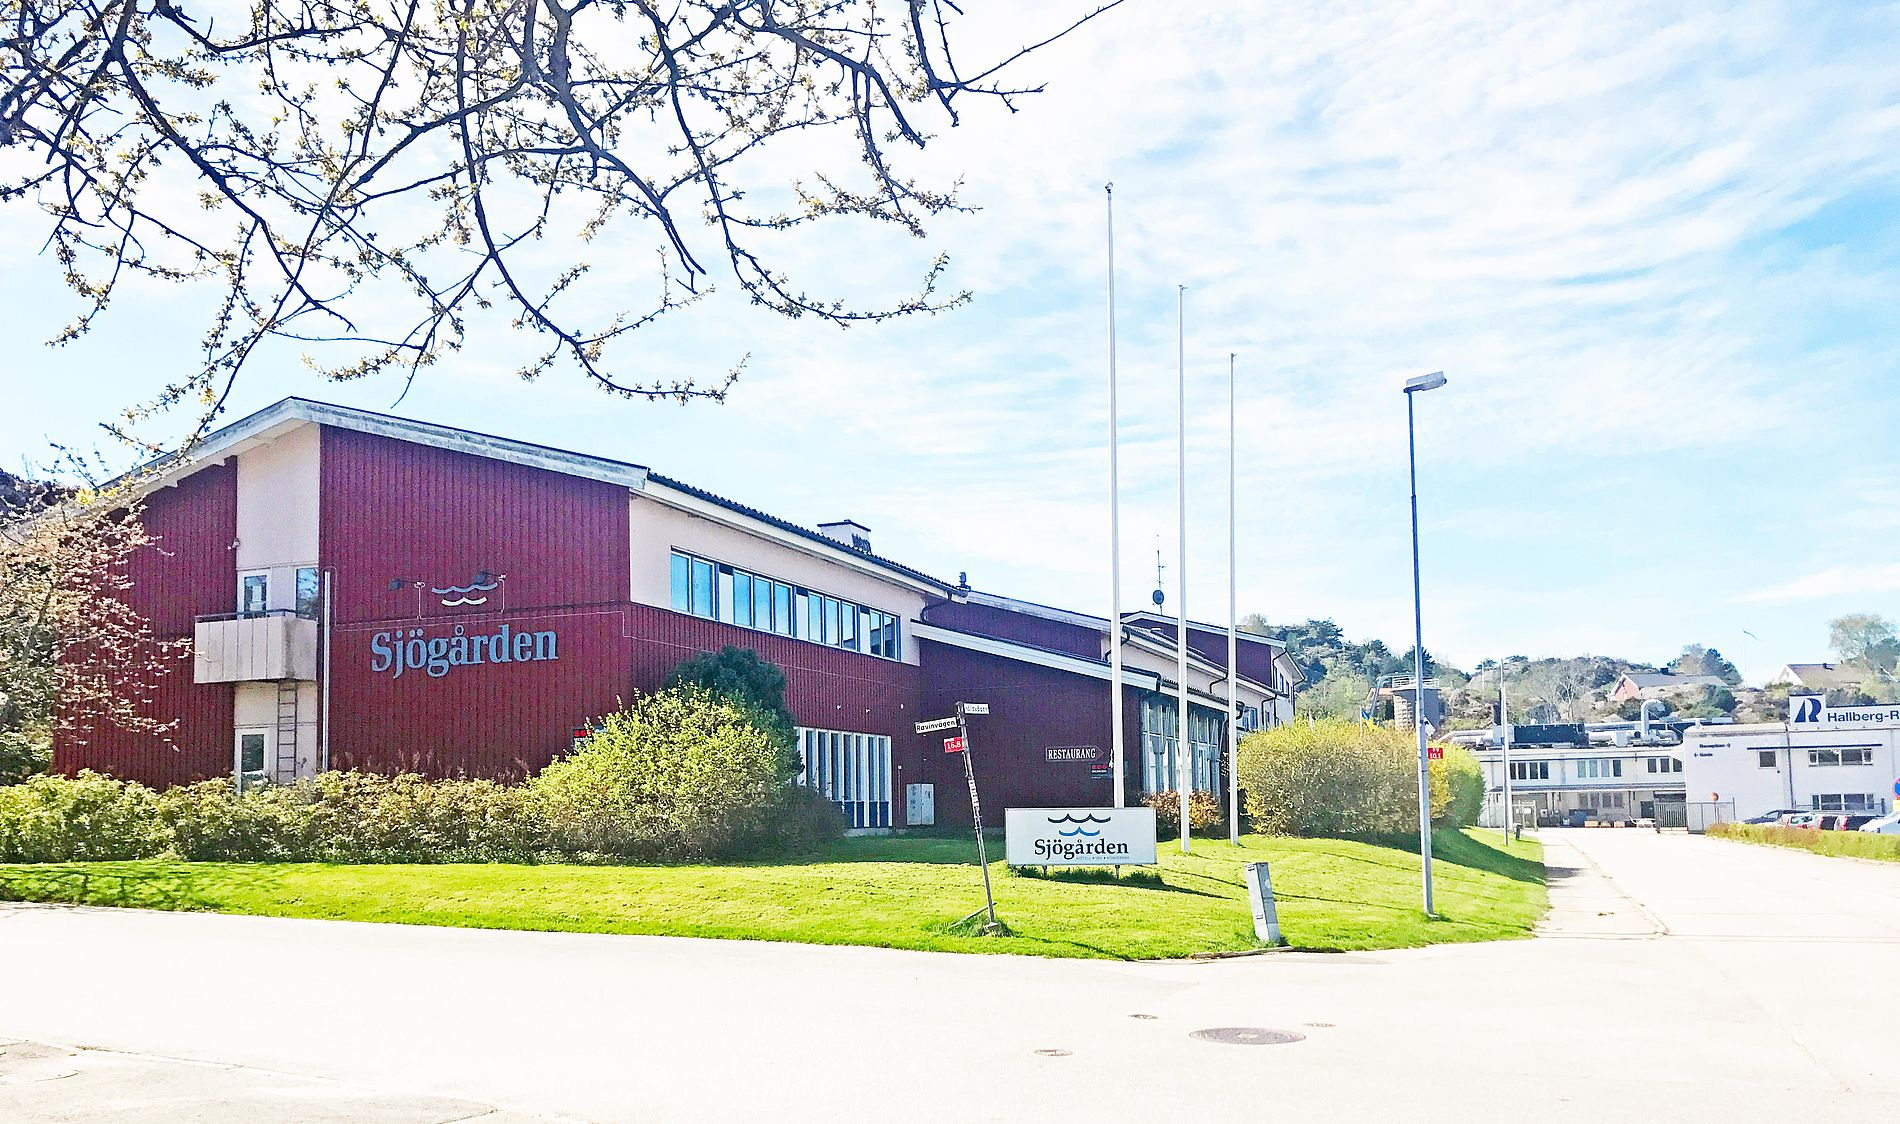 Sjögården opens up again